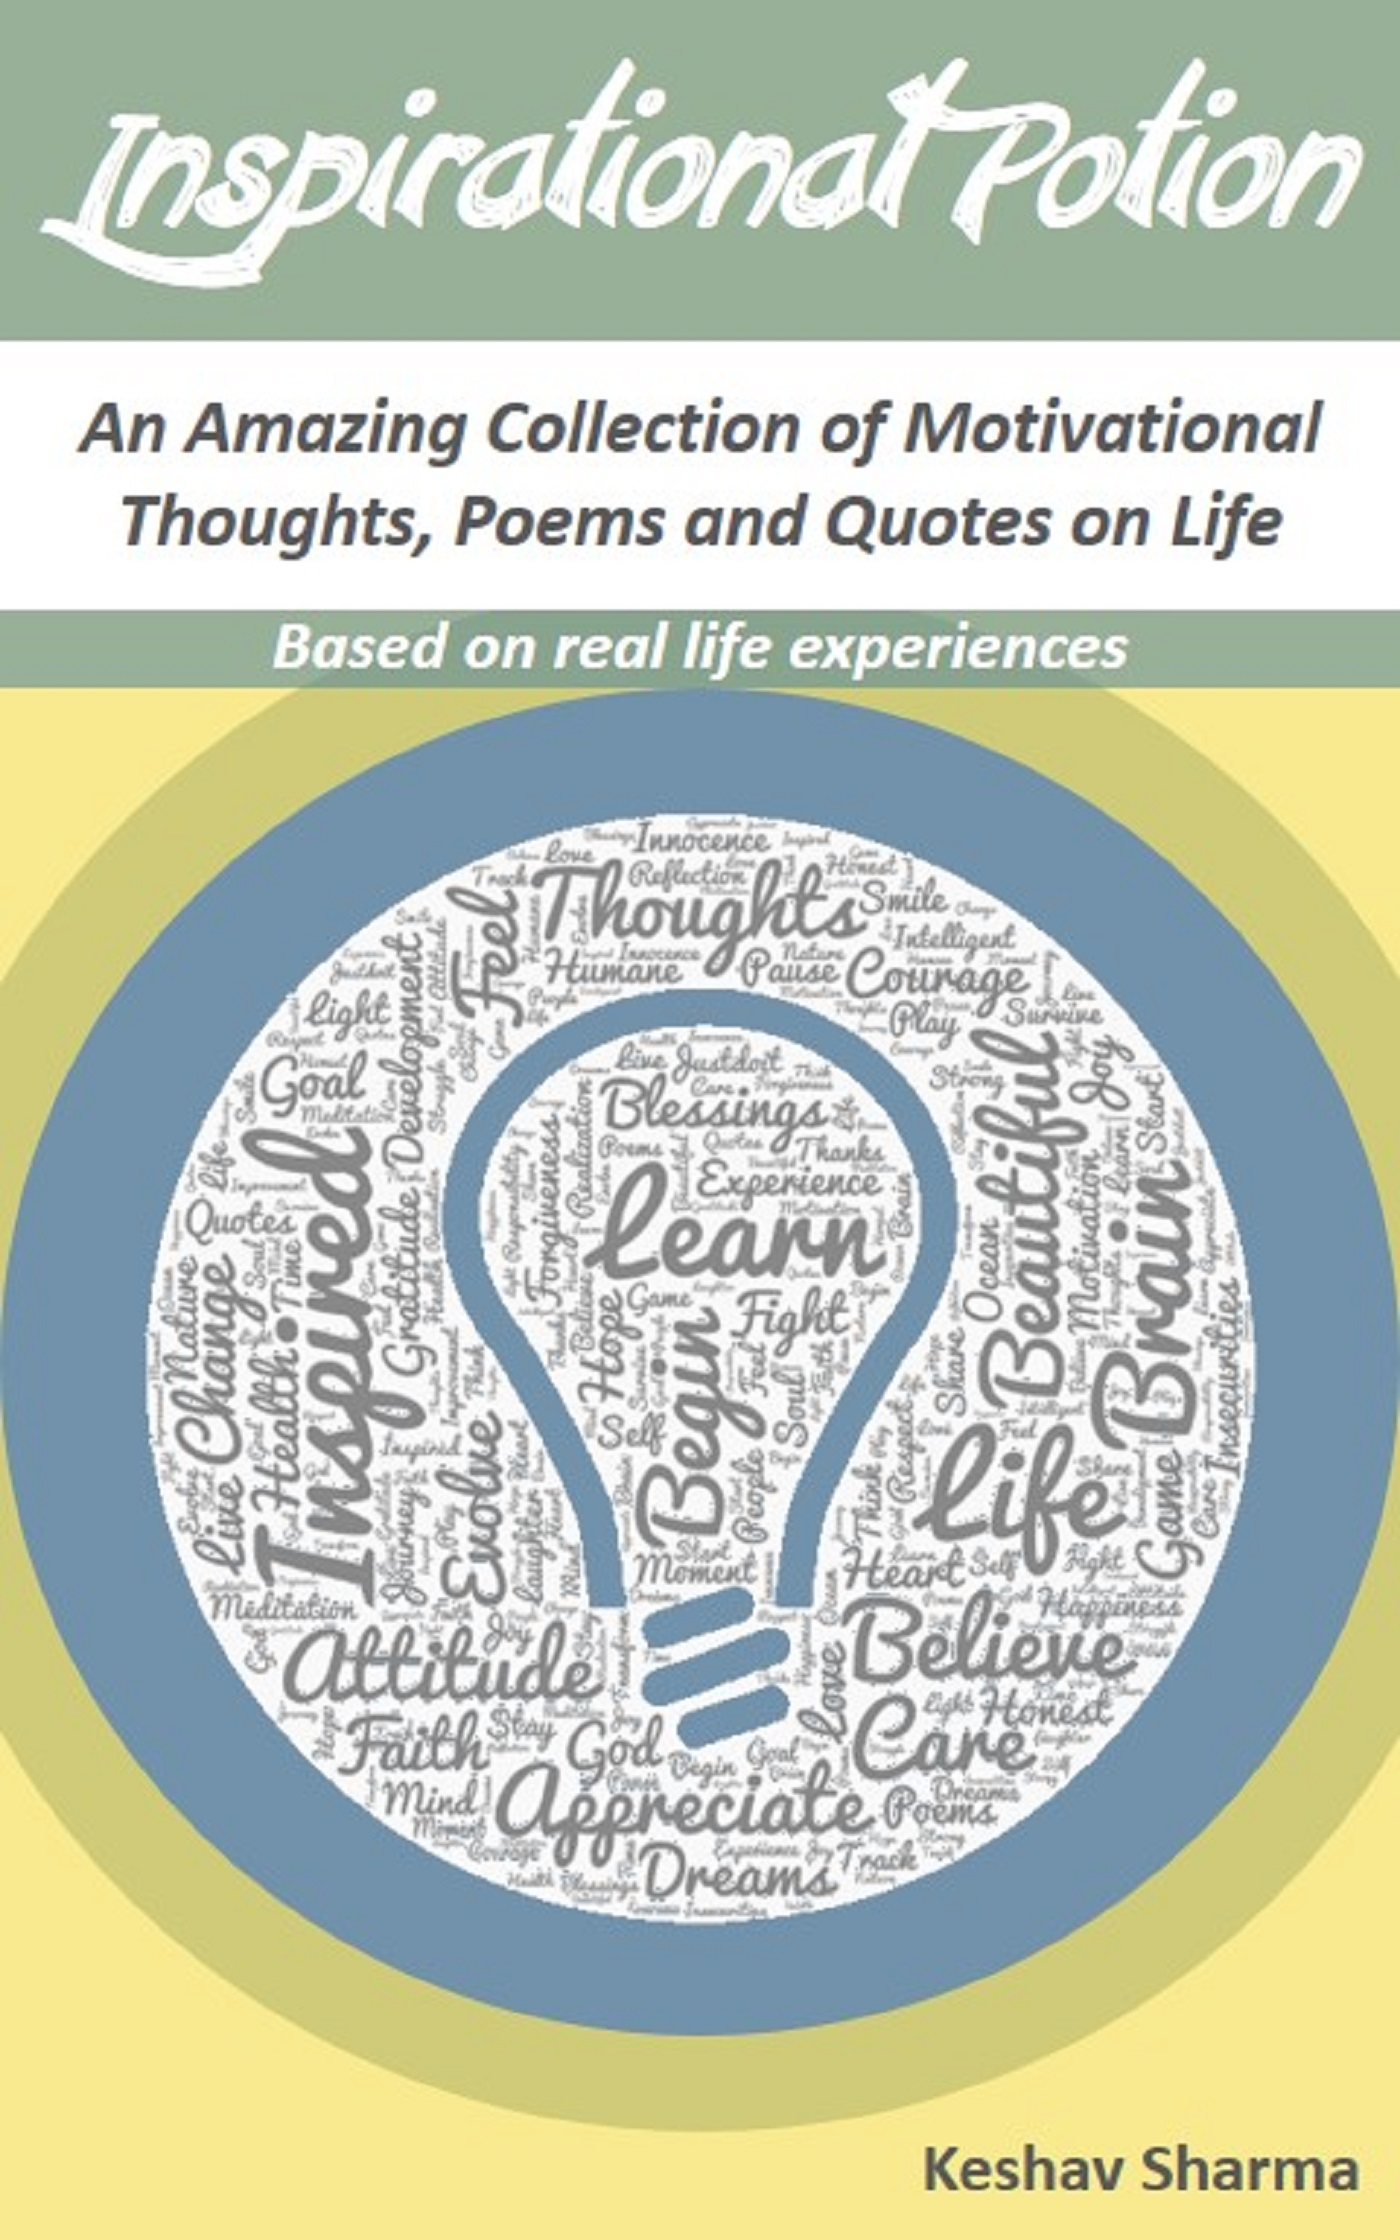 Real Life Poems Quotes Smashwords  Inspirational Potion  A Bookkeshav Sharma